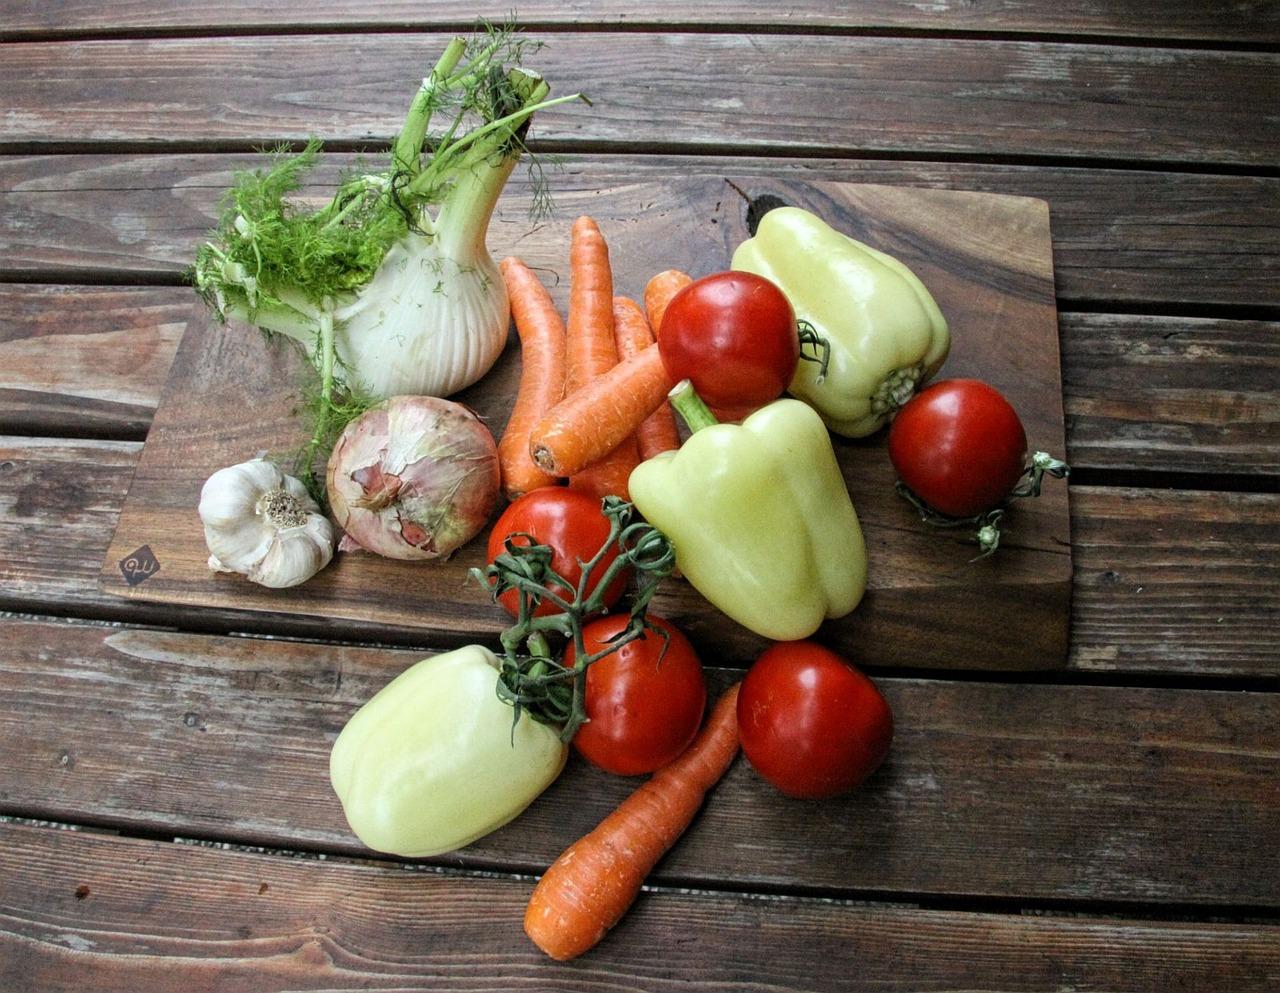 vegetables-959928_1280.jpg